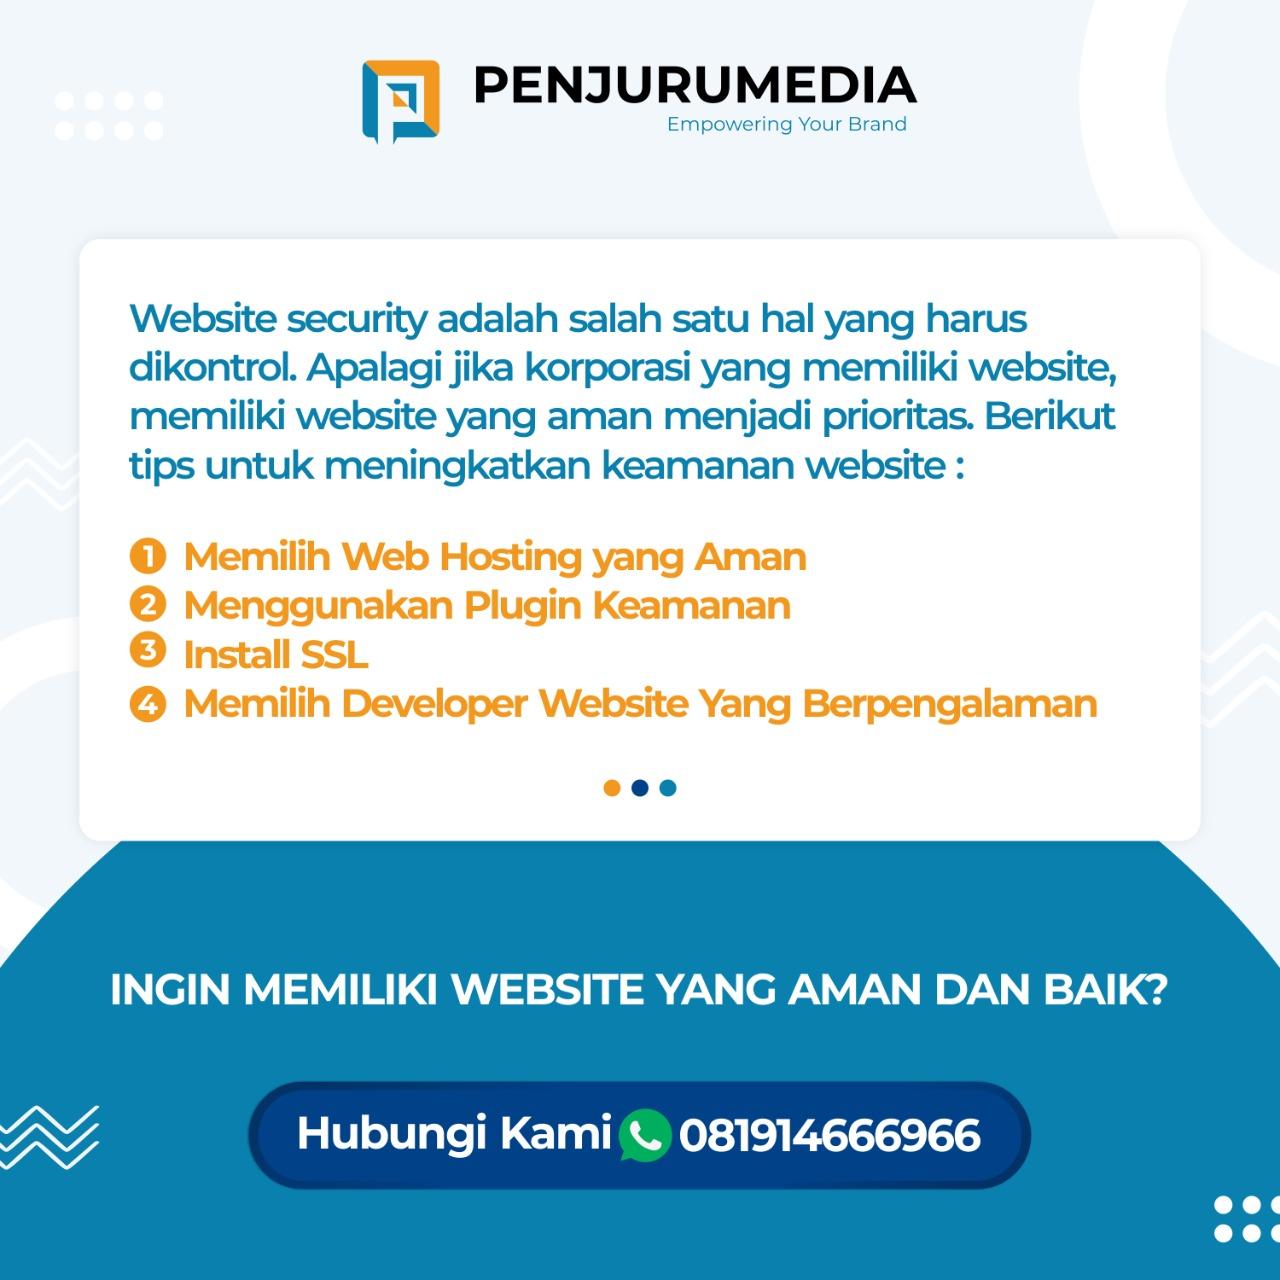 Tips Meningkatkan Keamanan Website (2)